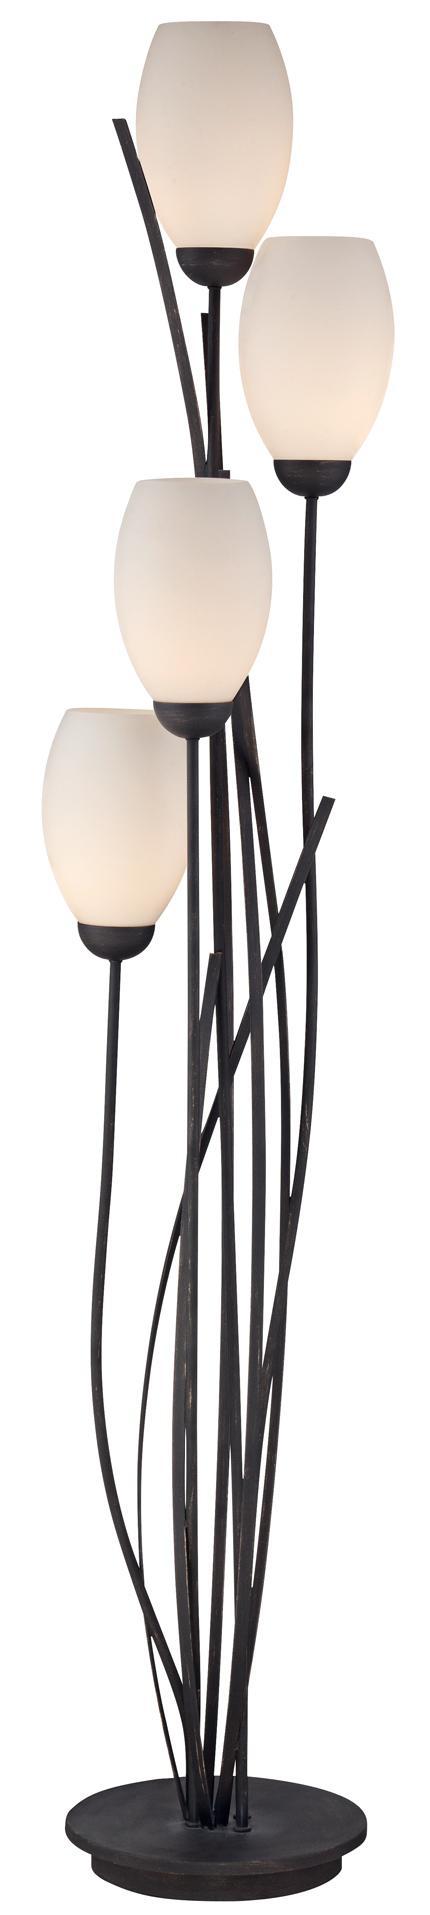 Black Metal And White Glass Tulip 4 Light Floor Lamp U2560 Lamps Plus Floor Lamp Modern Floor Lamps White Glass